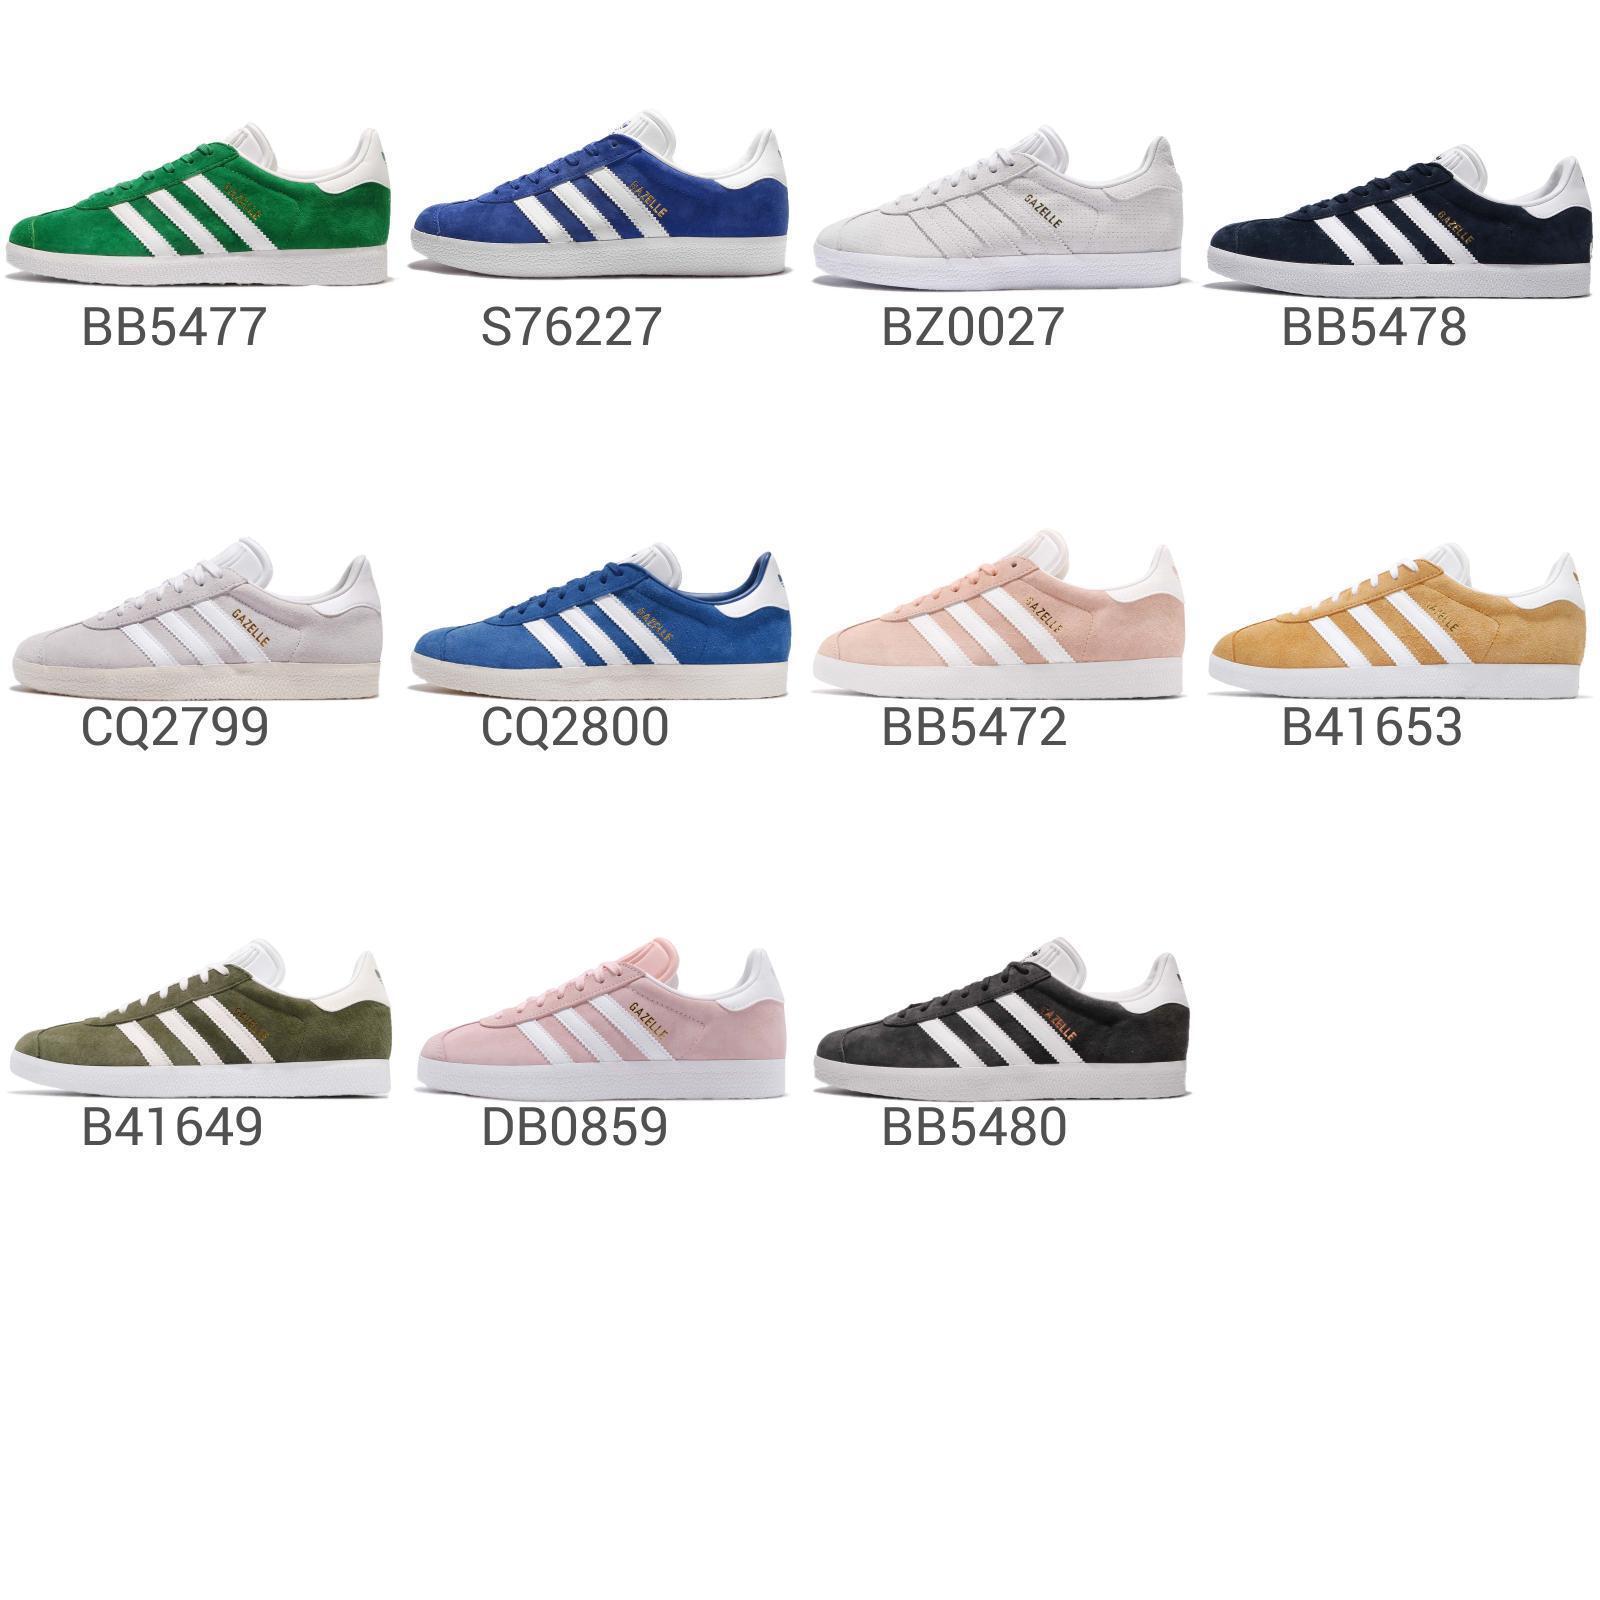 Adidas Originals Gazelle Mens   Womens Casual shoes Classic Sneakers Pick 1